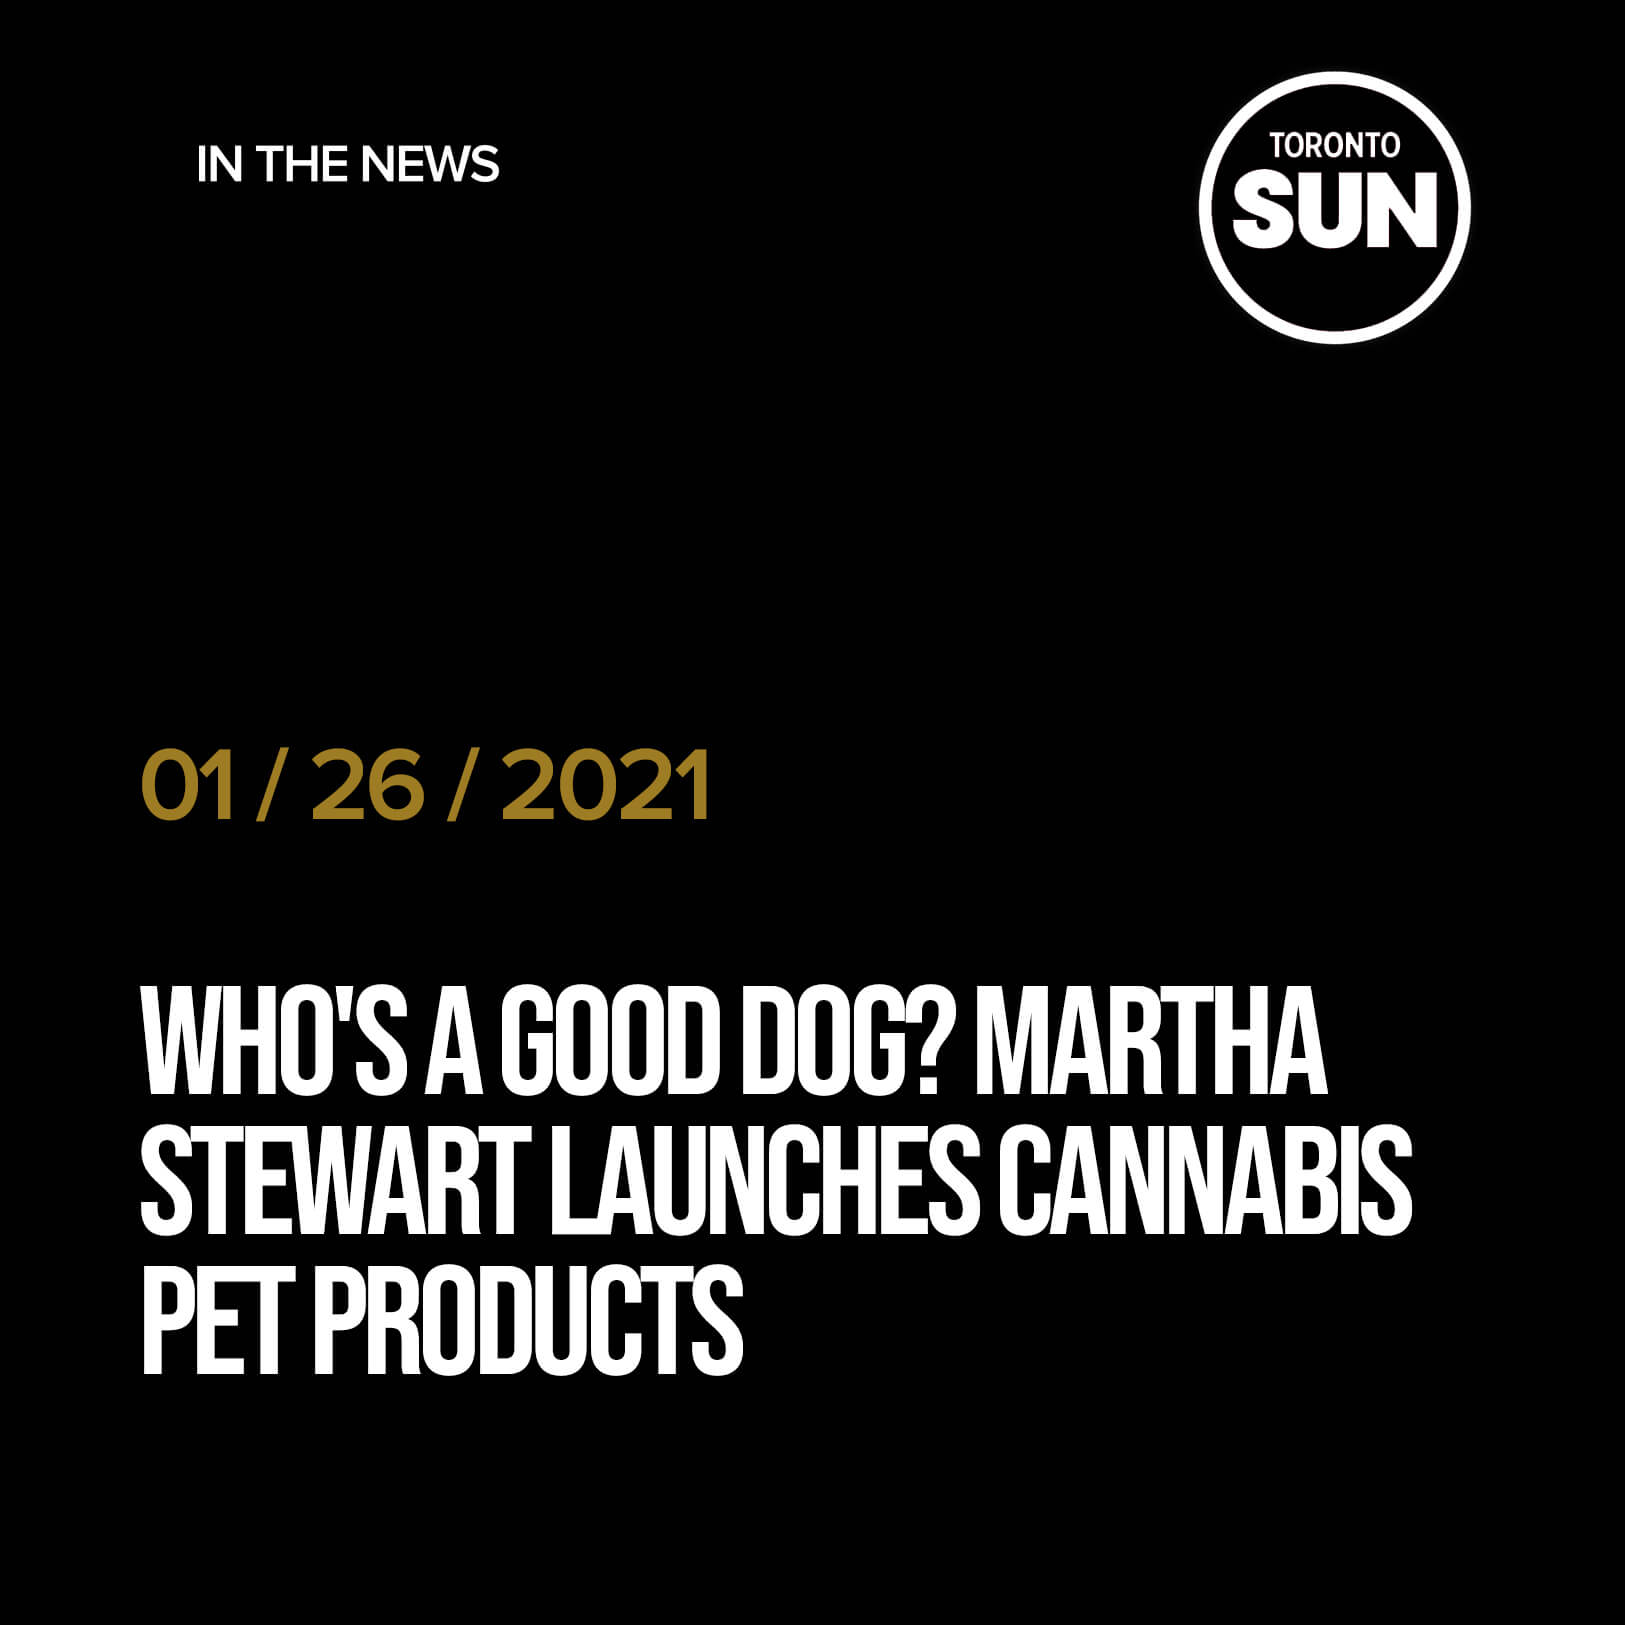 WHO'S A GOOD DOG? Martha Stewart launches cannabis pet products